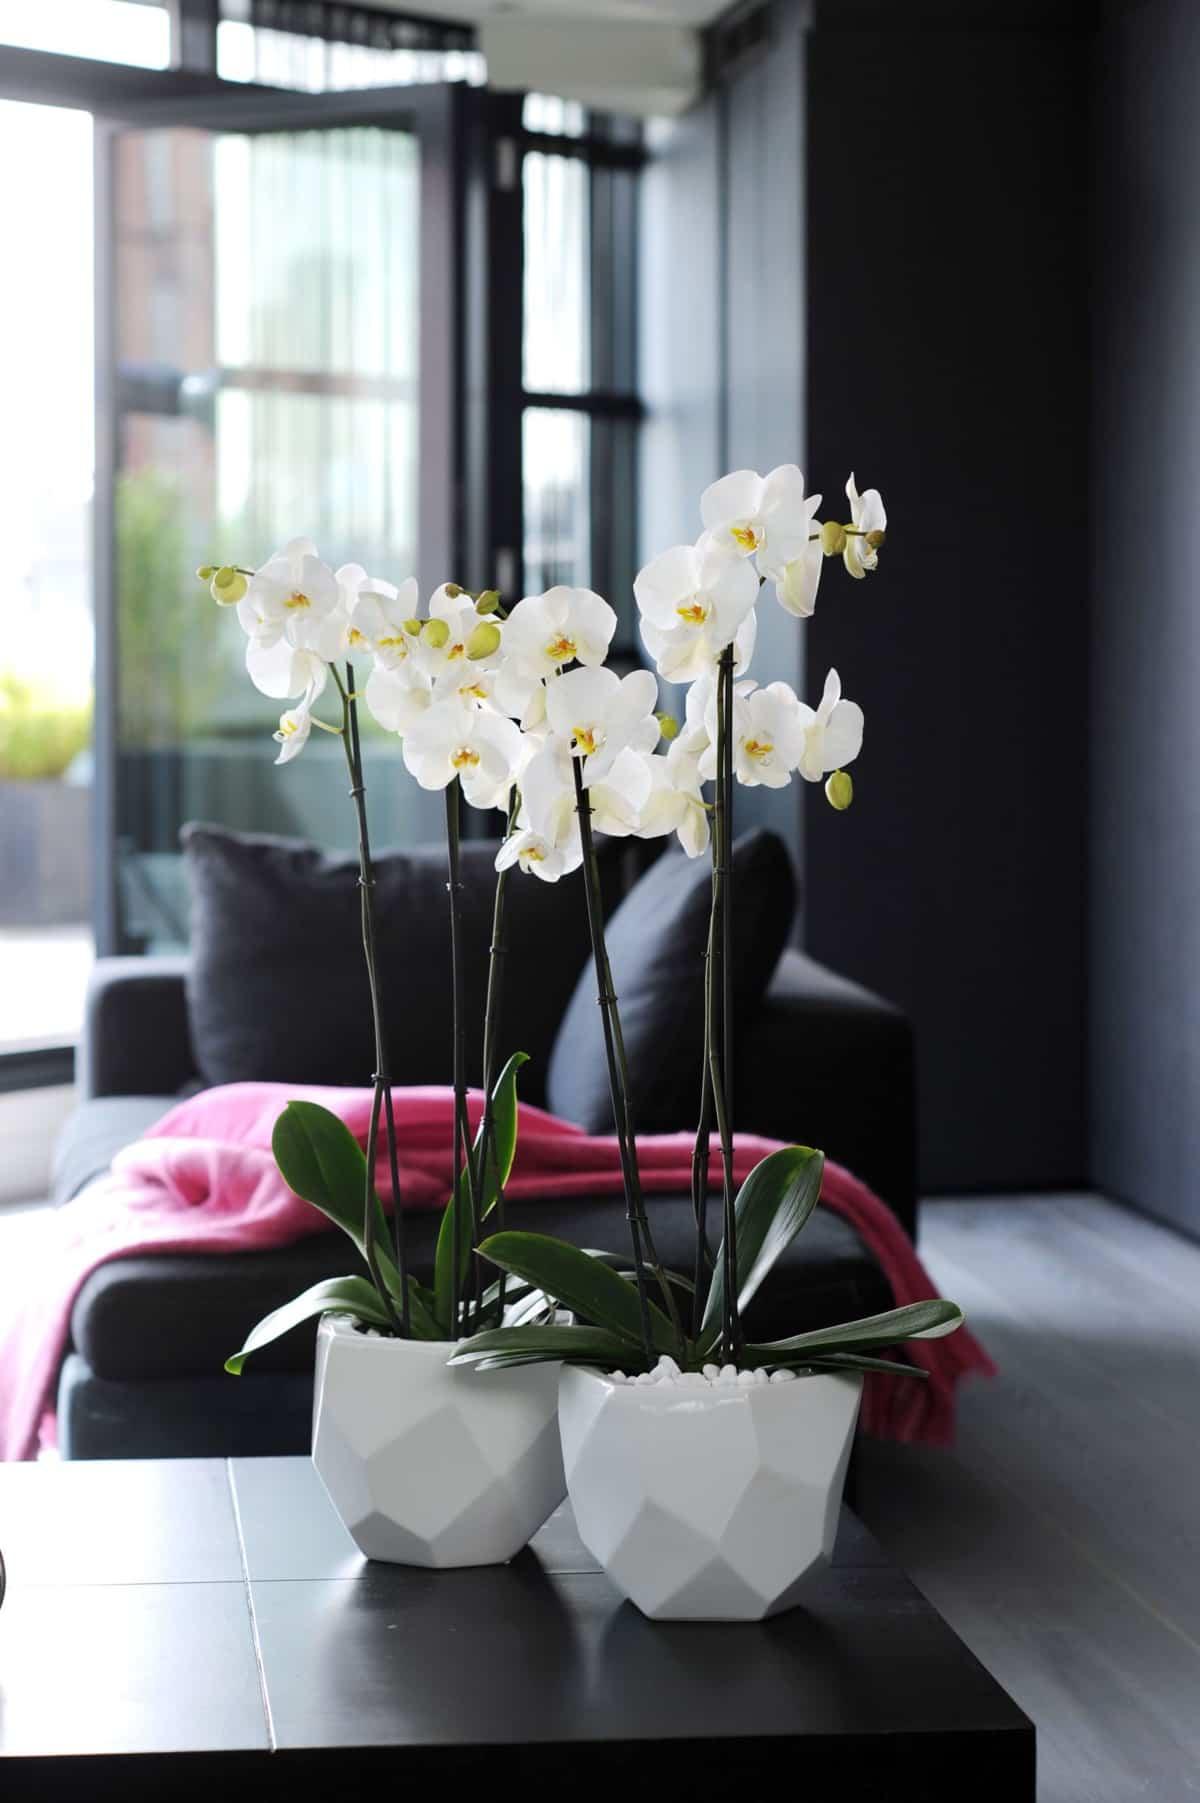 claves para decorar con orquideas tu hogar 8